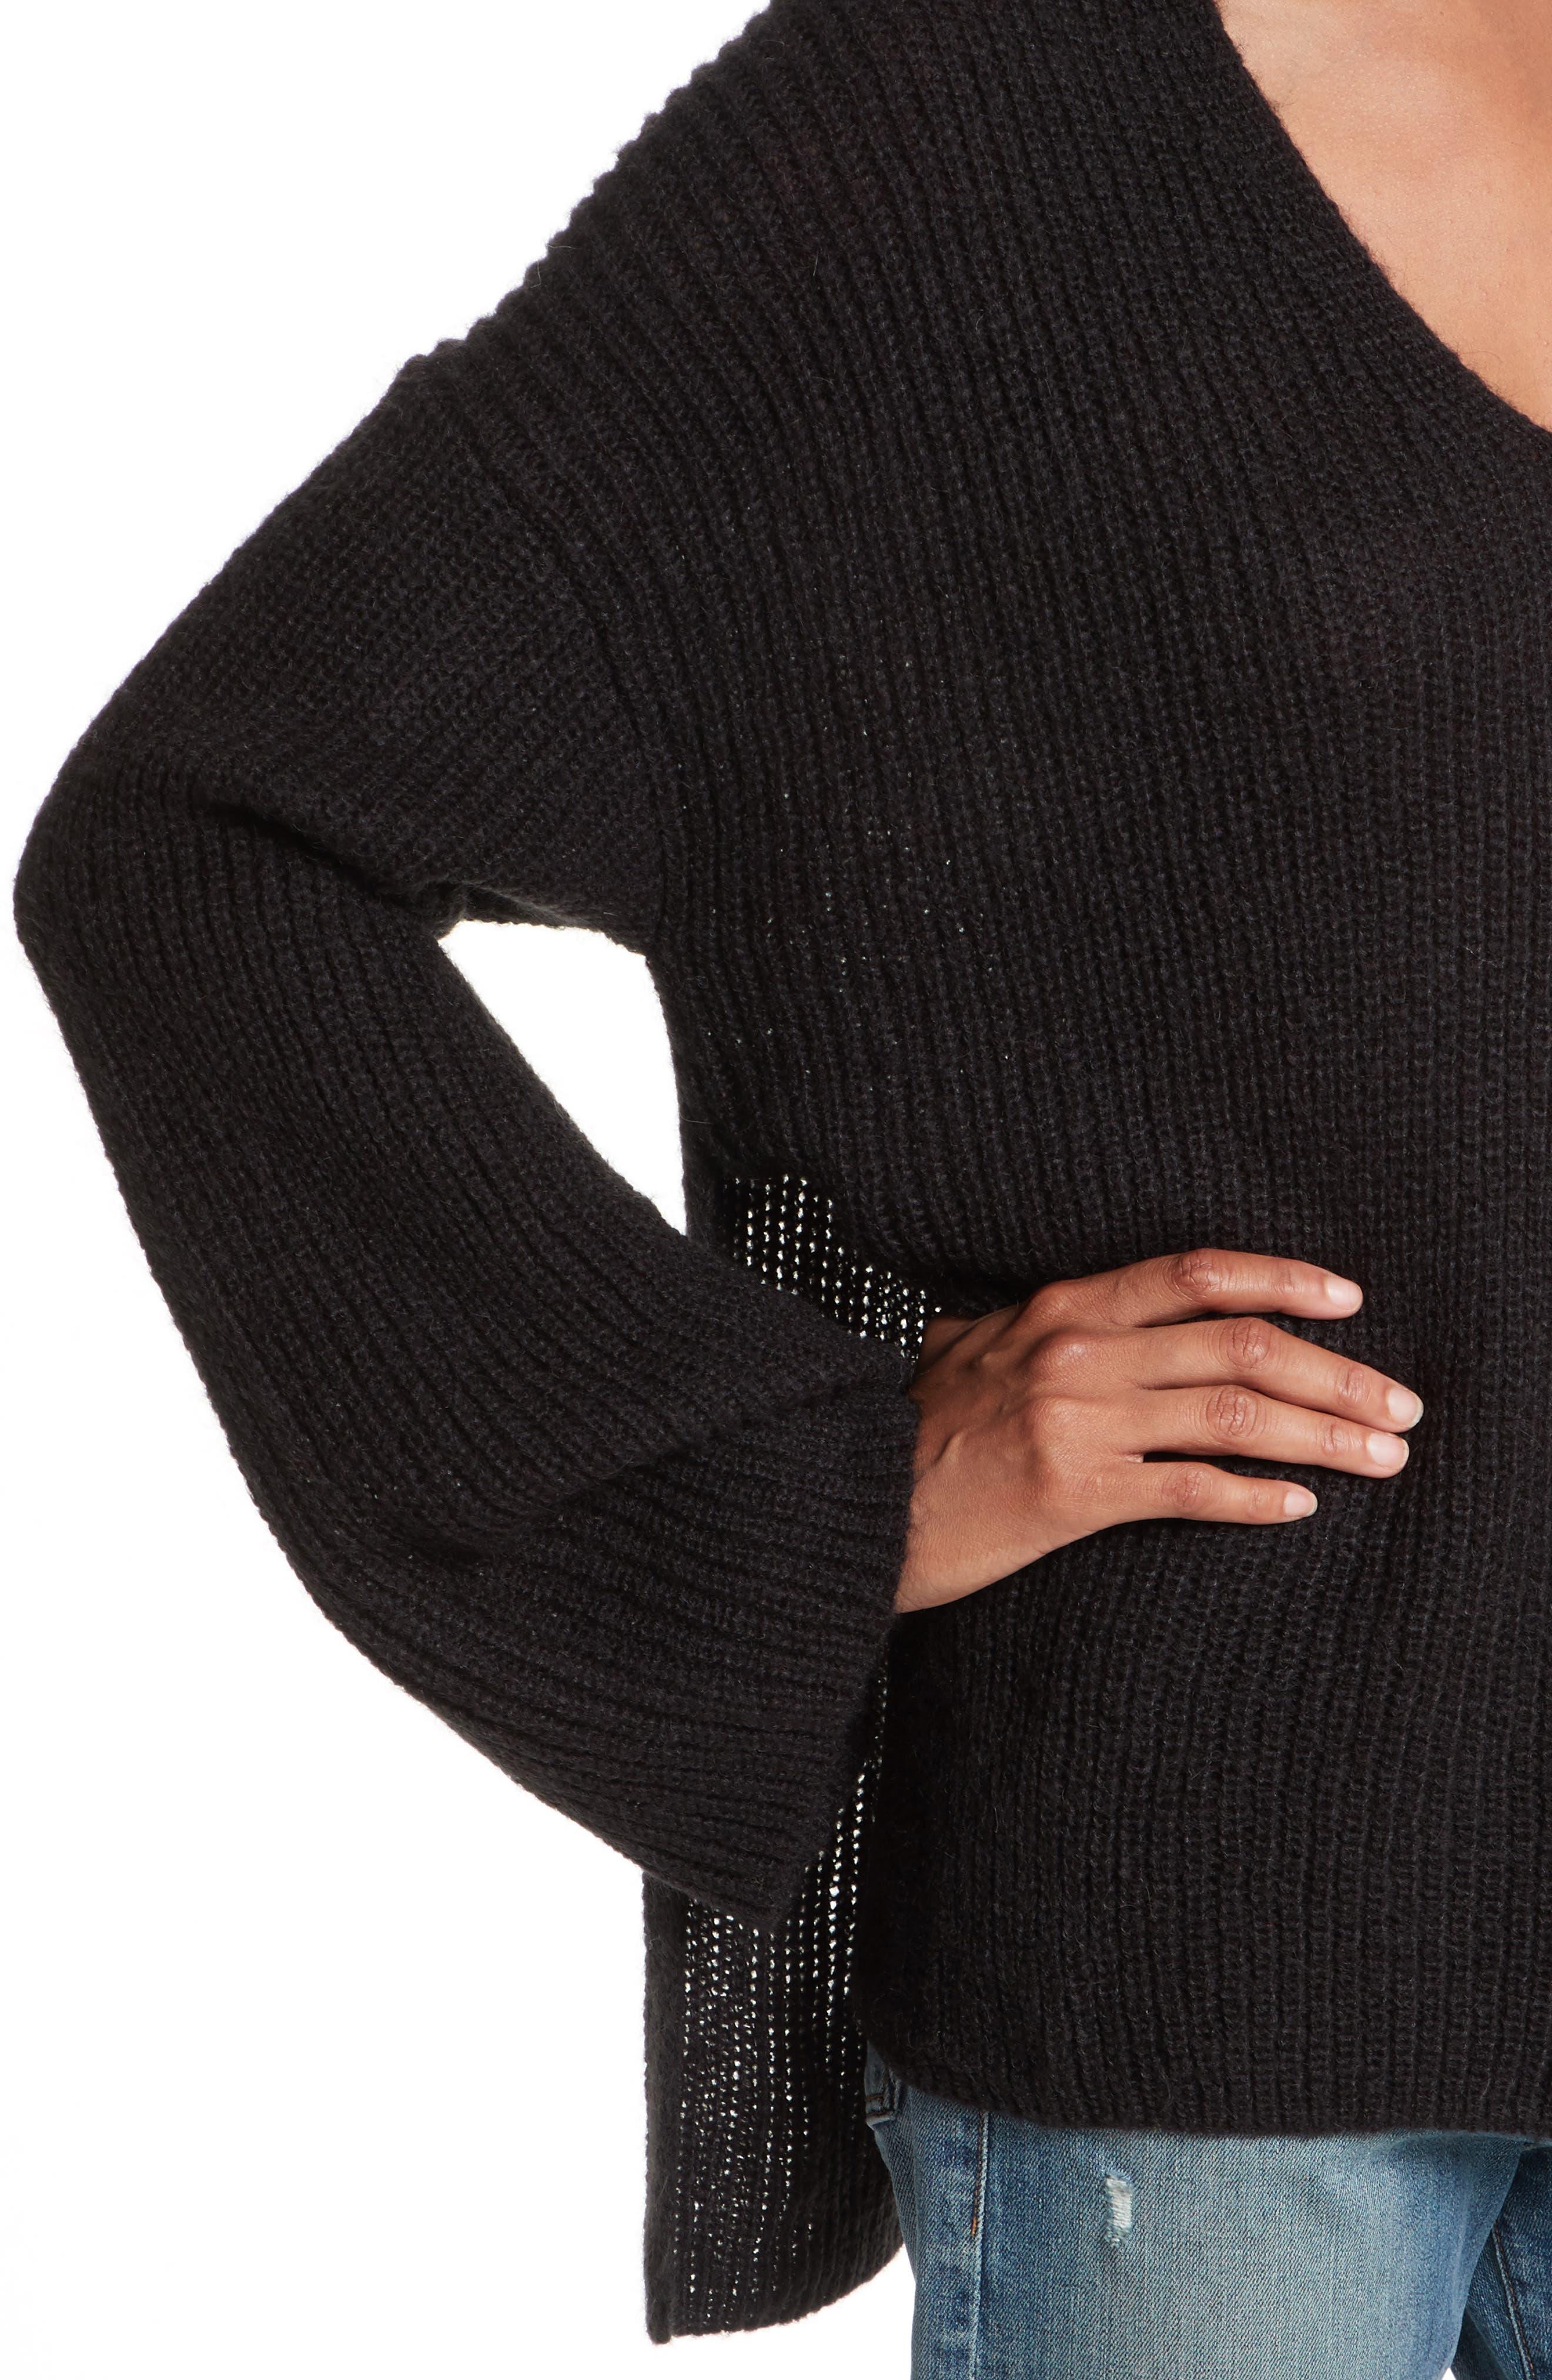 Remi Oversize Sweater,                             Alternate thumbnail 4, color,                             001